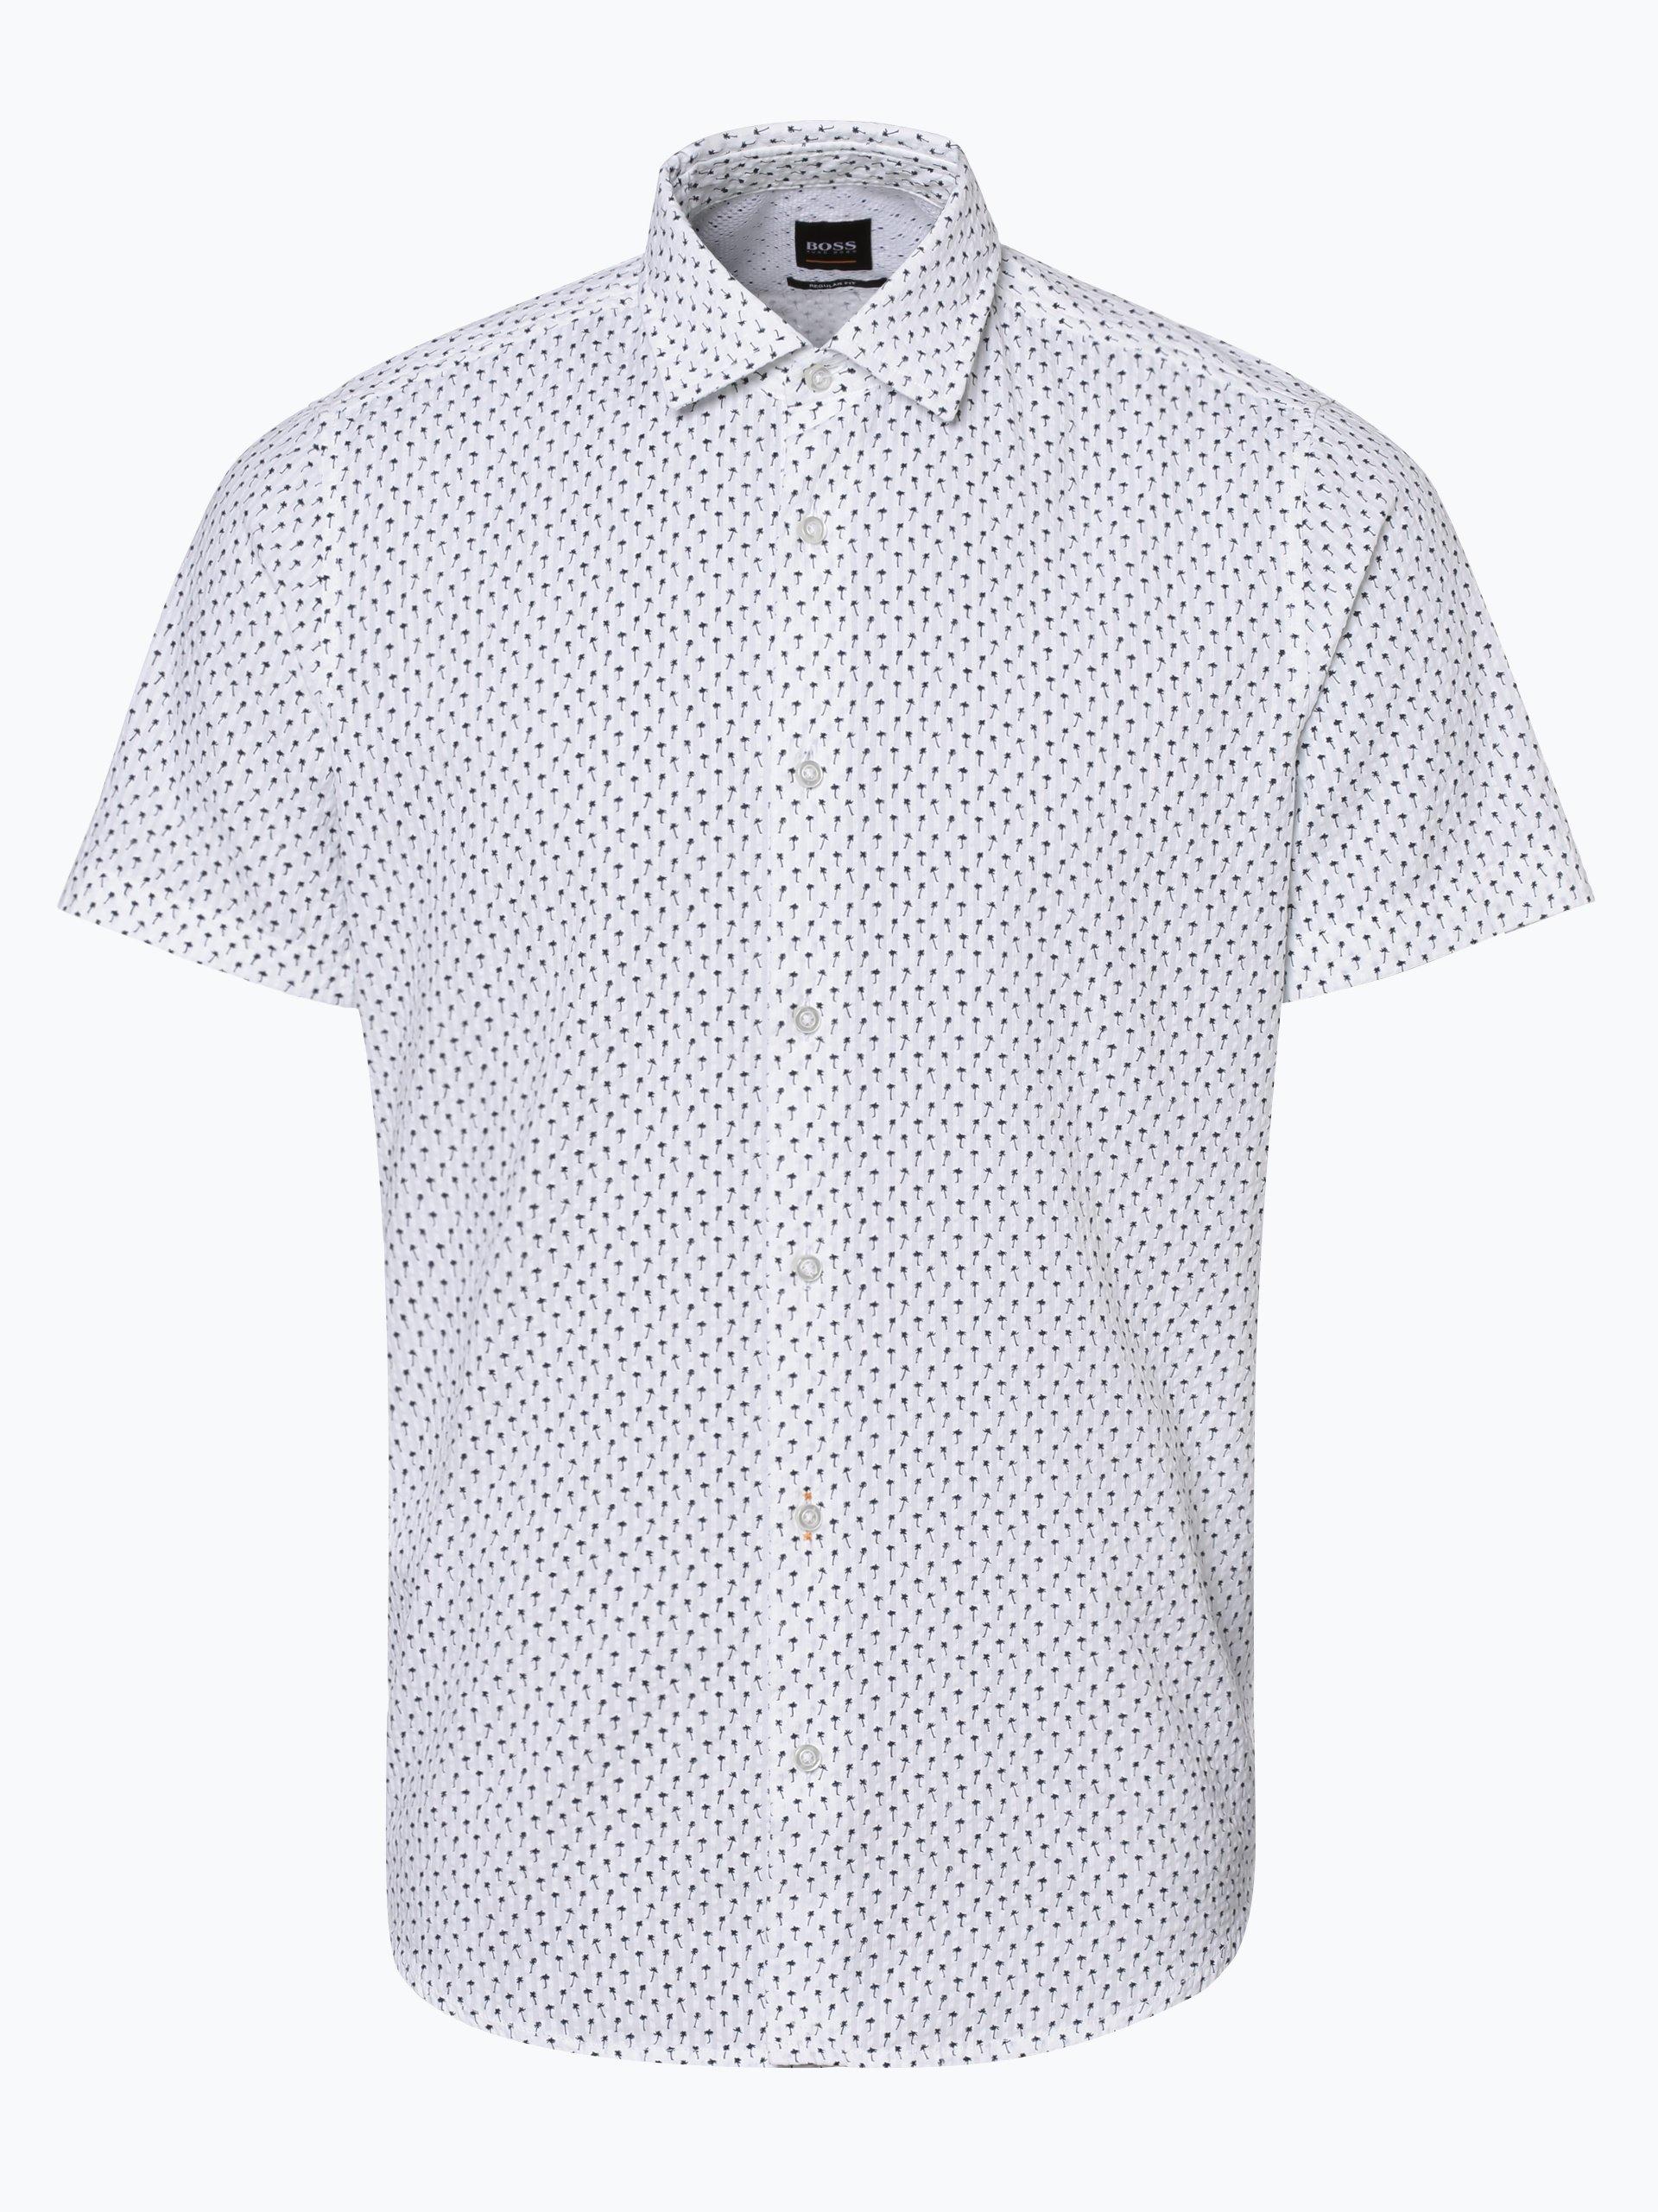 BOSS Casual Koszula męska – Rash